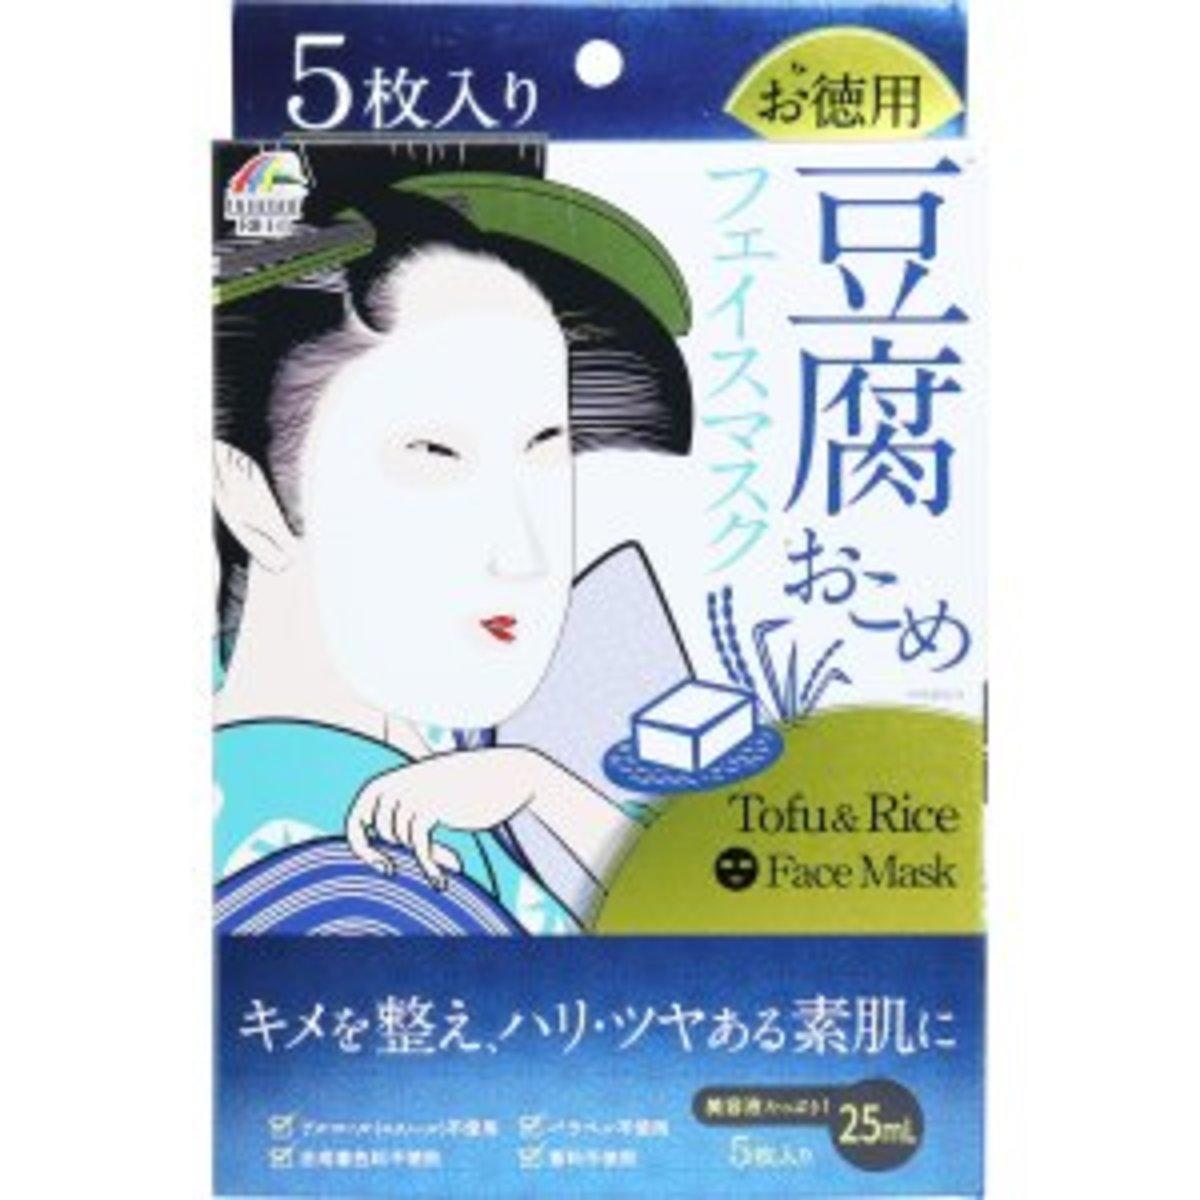 TOFU & RICE FACE MASK  5 SHEETS